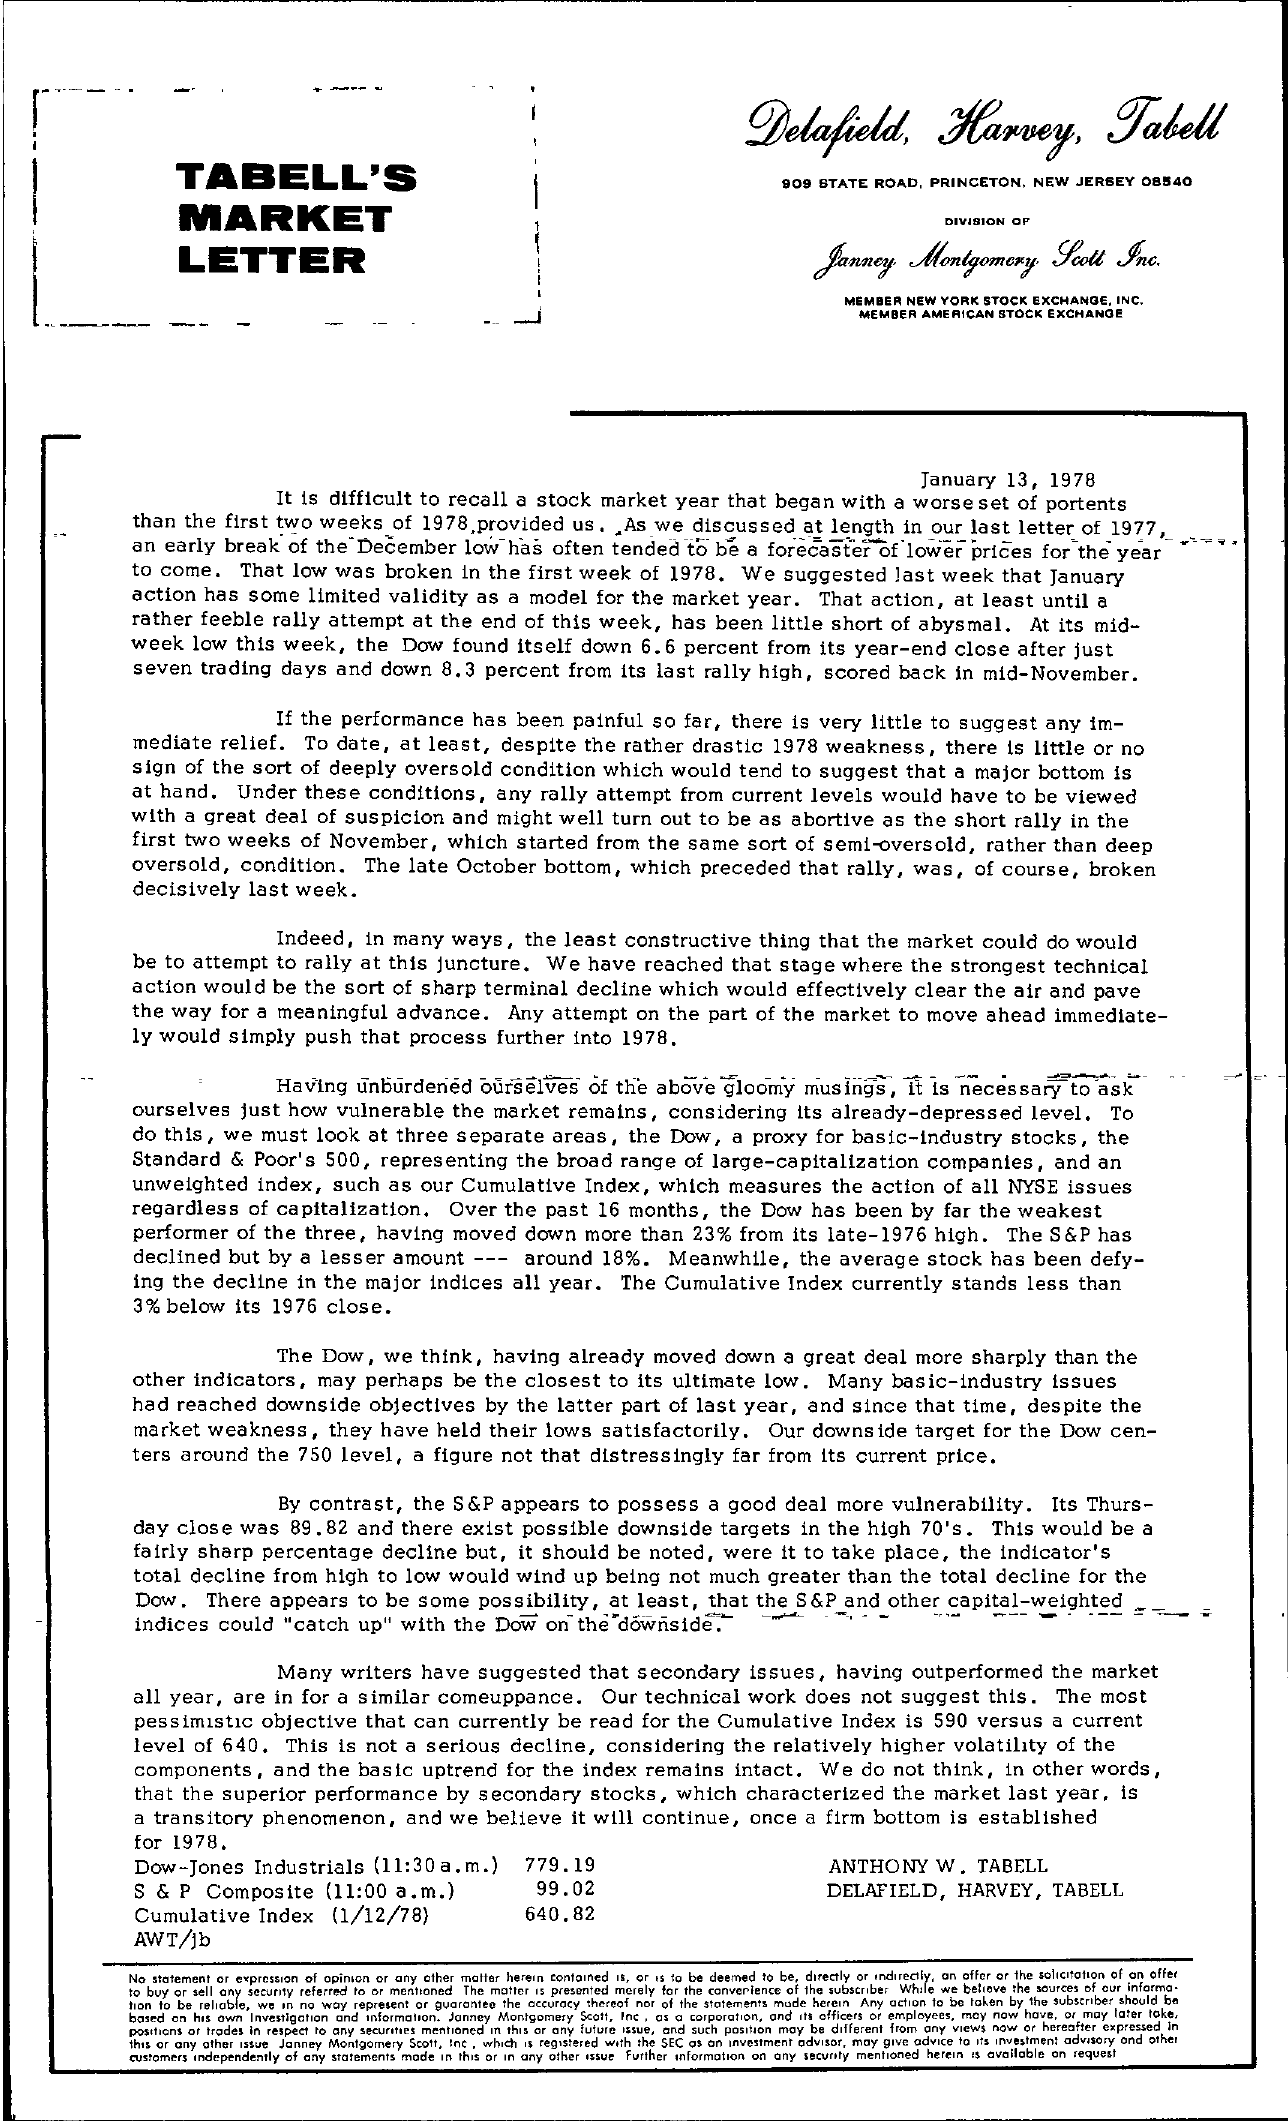 Tabell's Market Letter - January 13, 1978